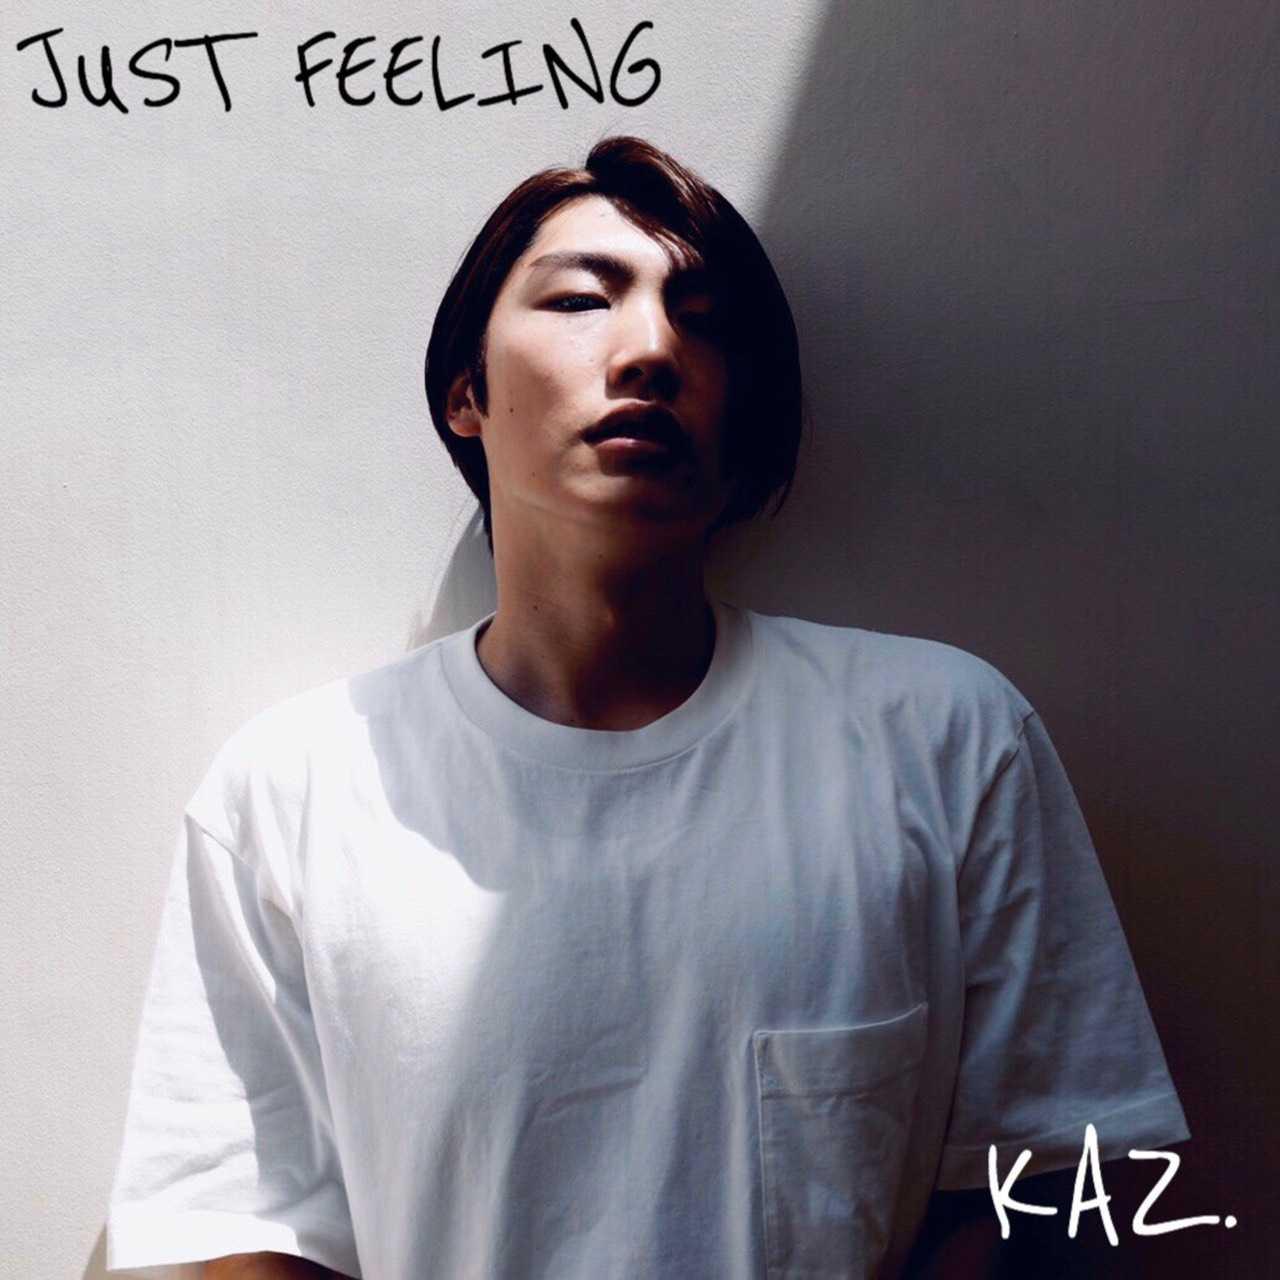 KAZ.の1st digital SINGLE「JUST FEELING」に中国からも熱い視線